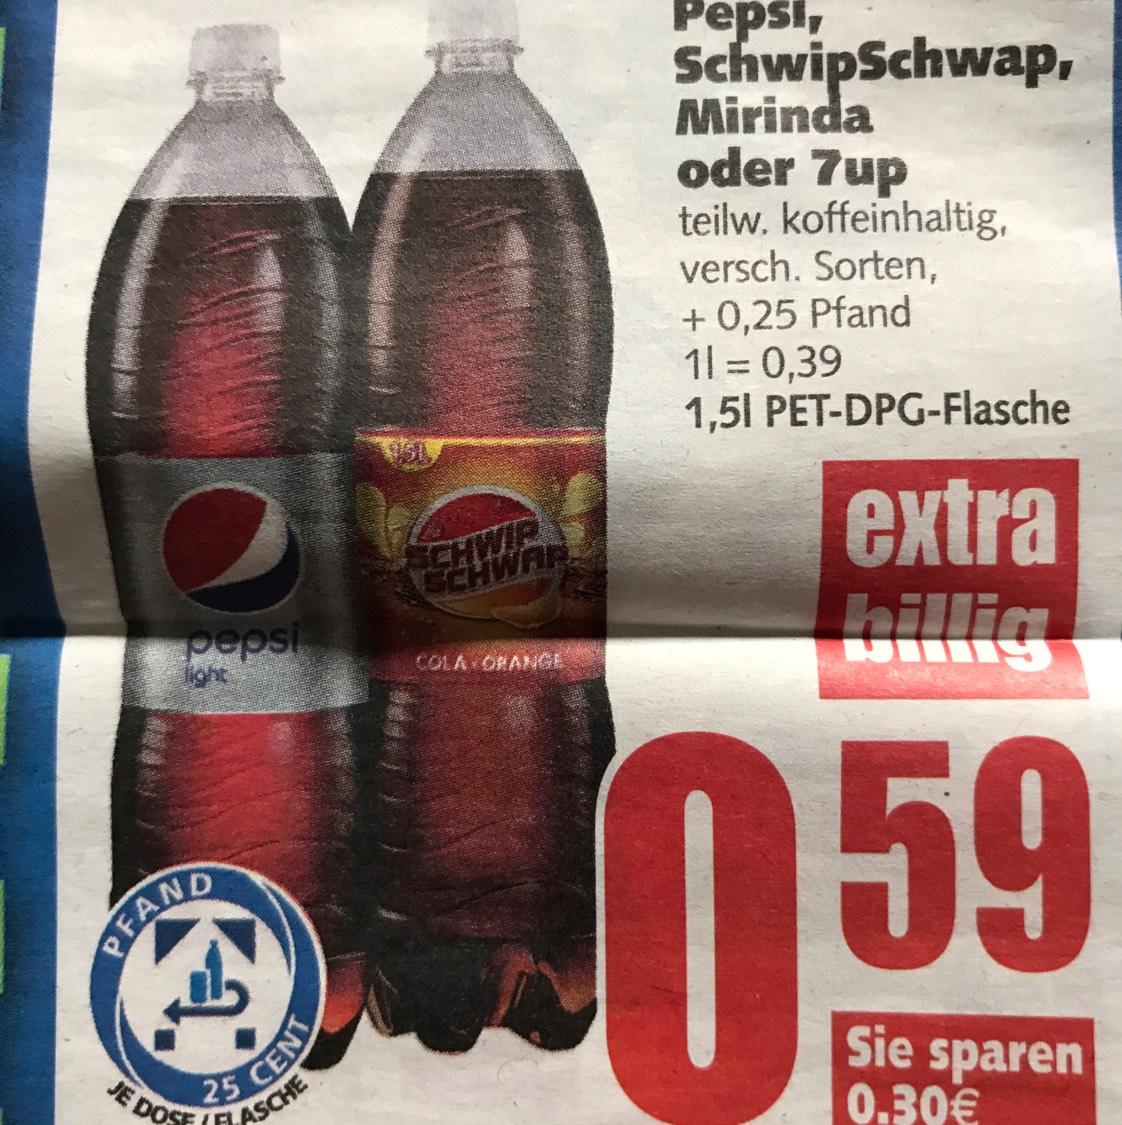 [EDEKA] Pepsi 1,5l PET 0,295 pro Flasche